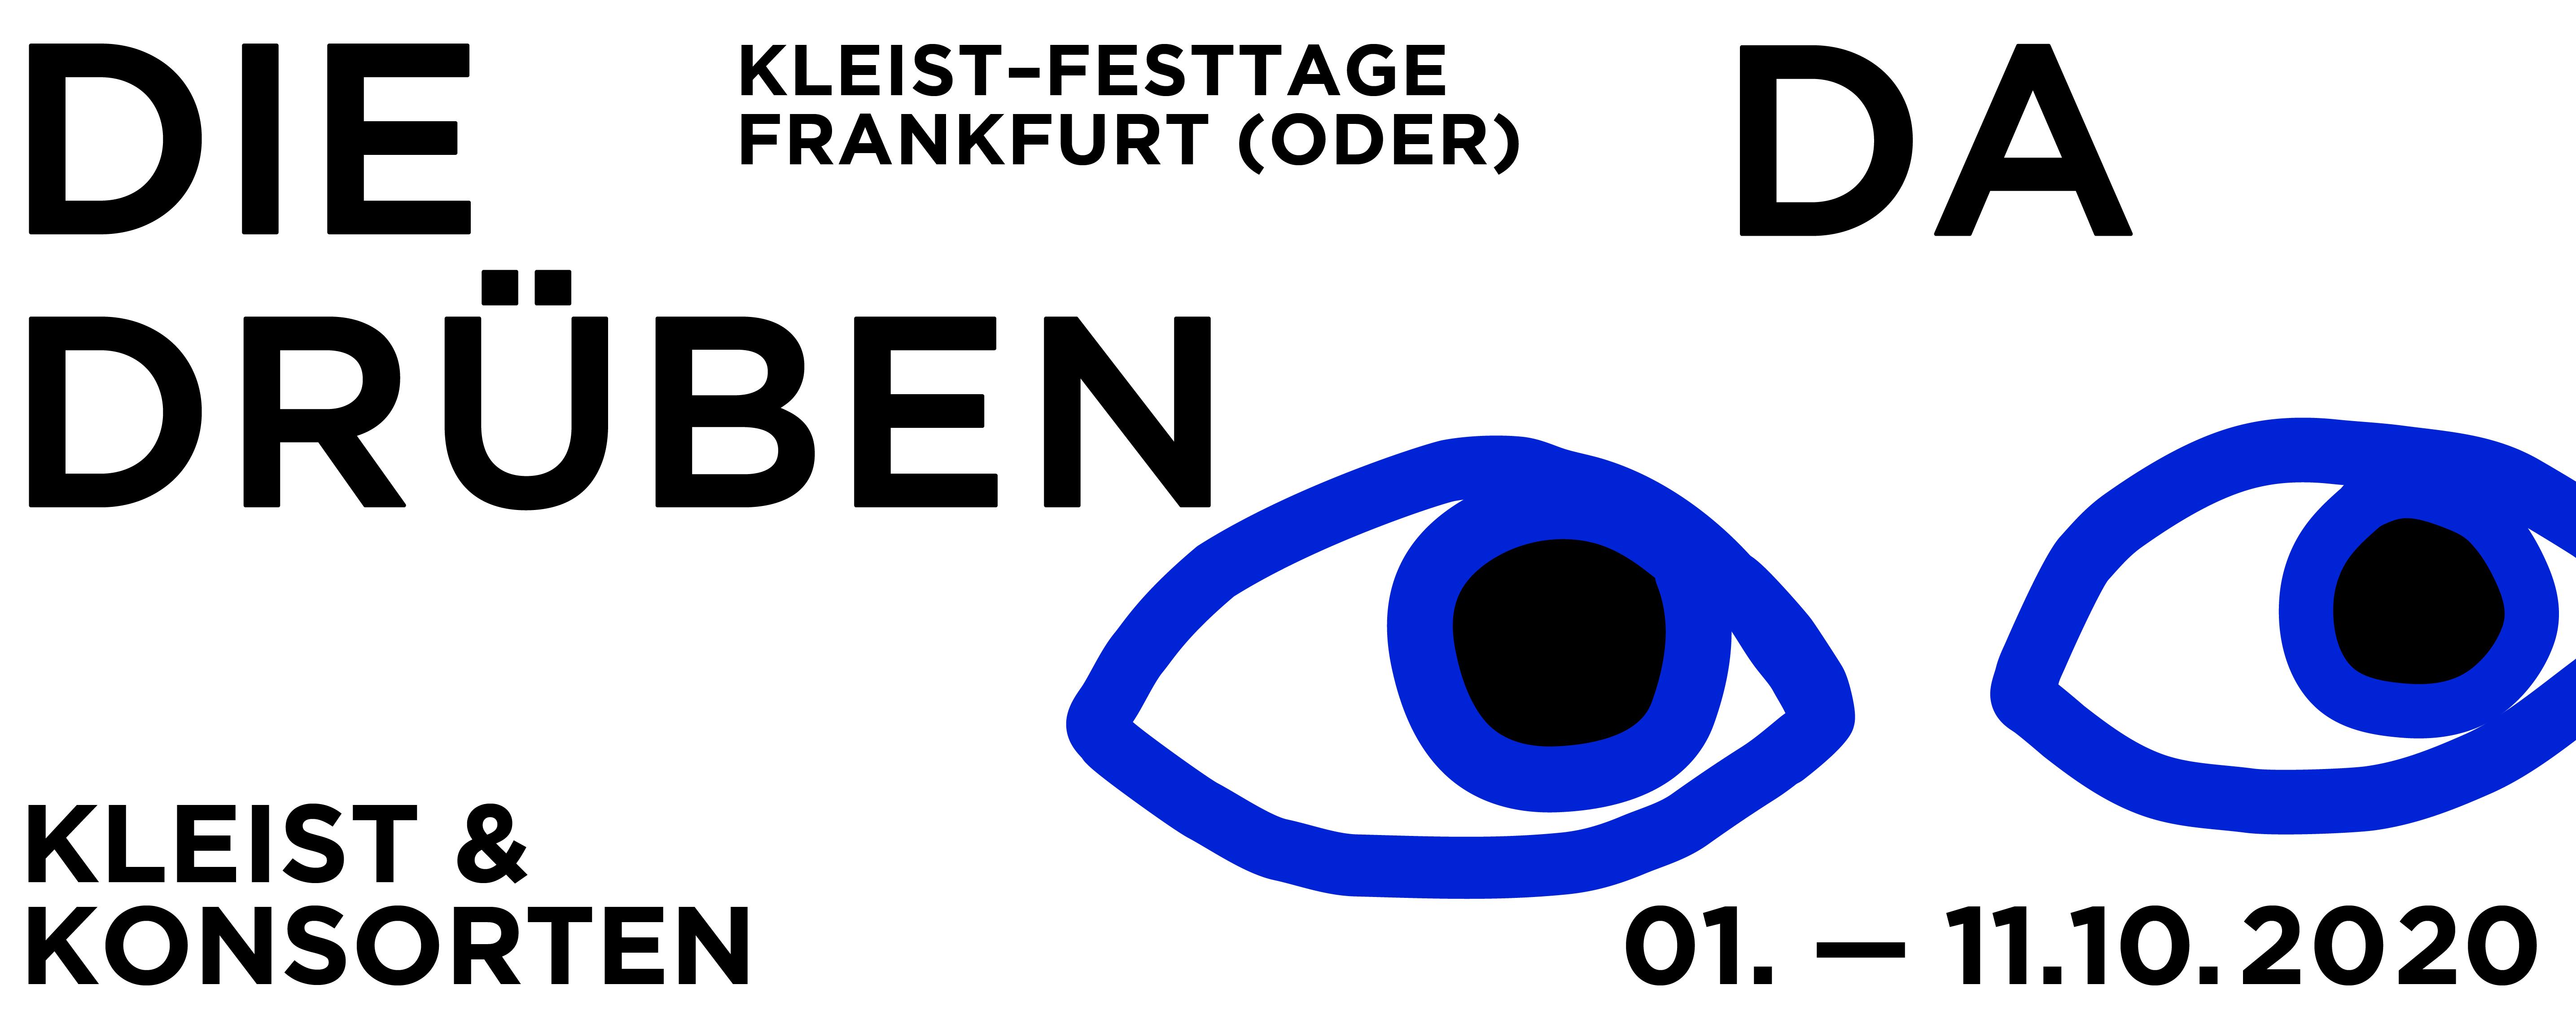 Kleist-Festtage 2020